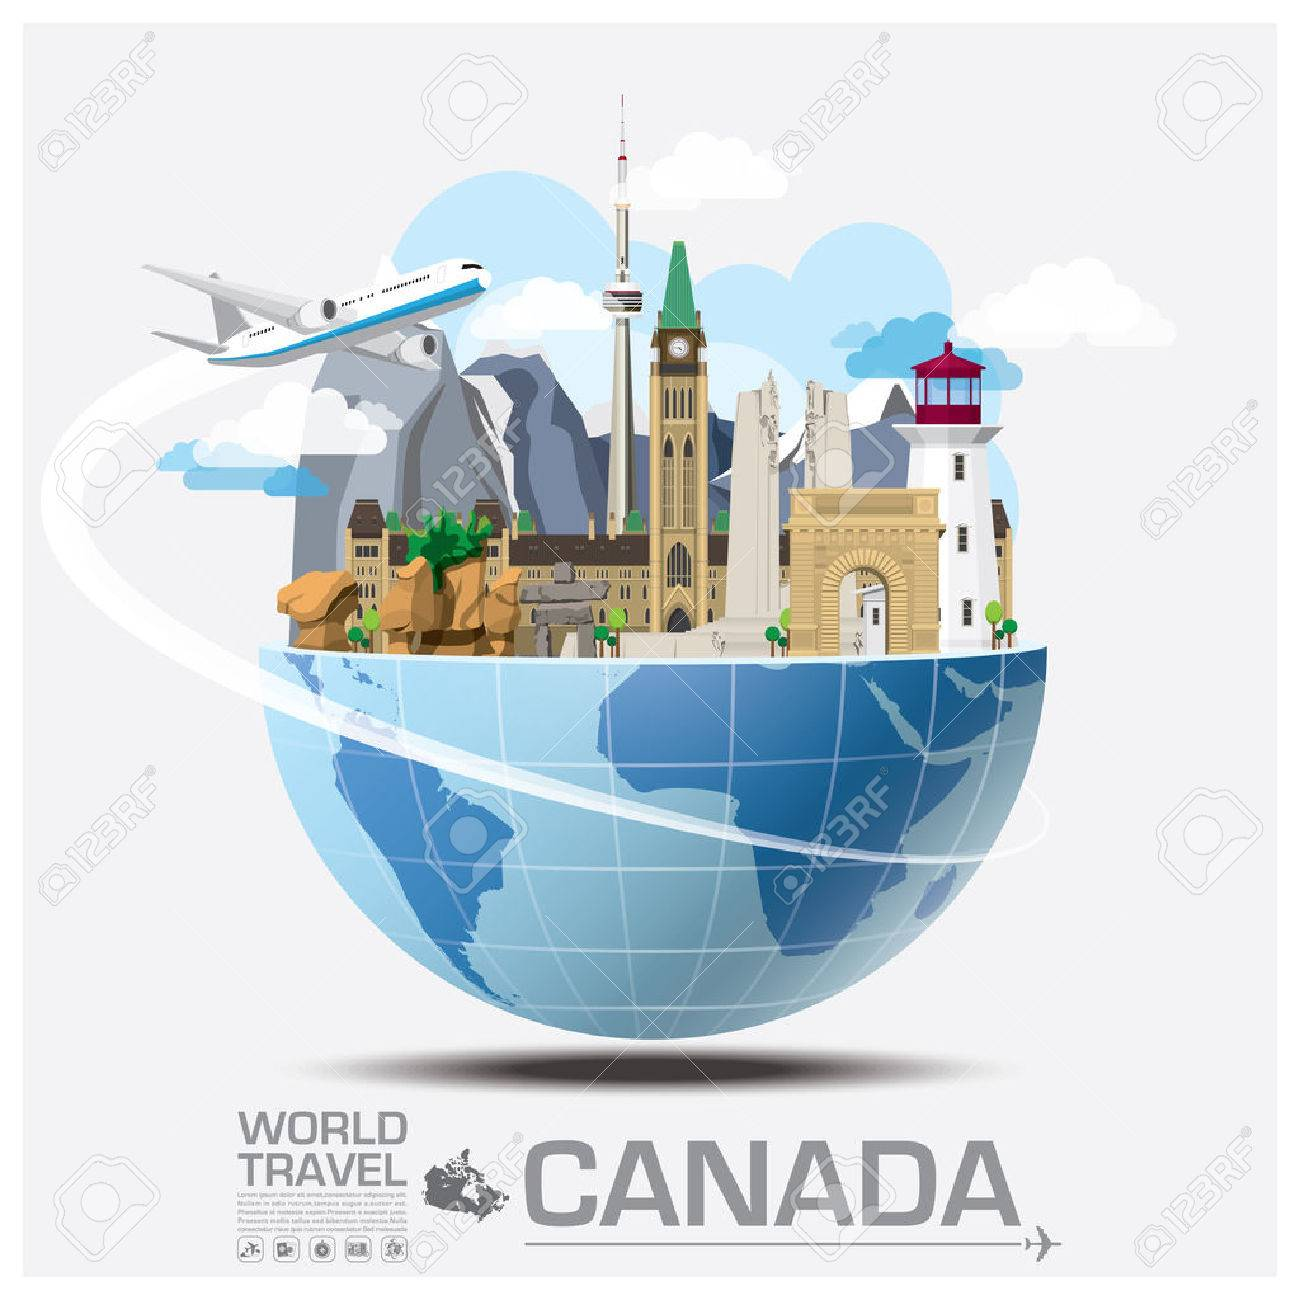 Canada Landmark Global Travel And Journey Infographic Vector Design Template Stock Vector - 47164996